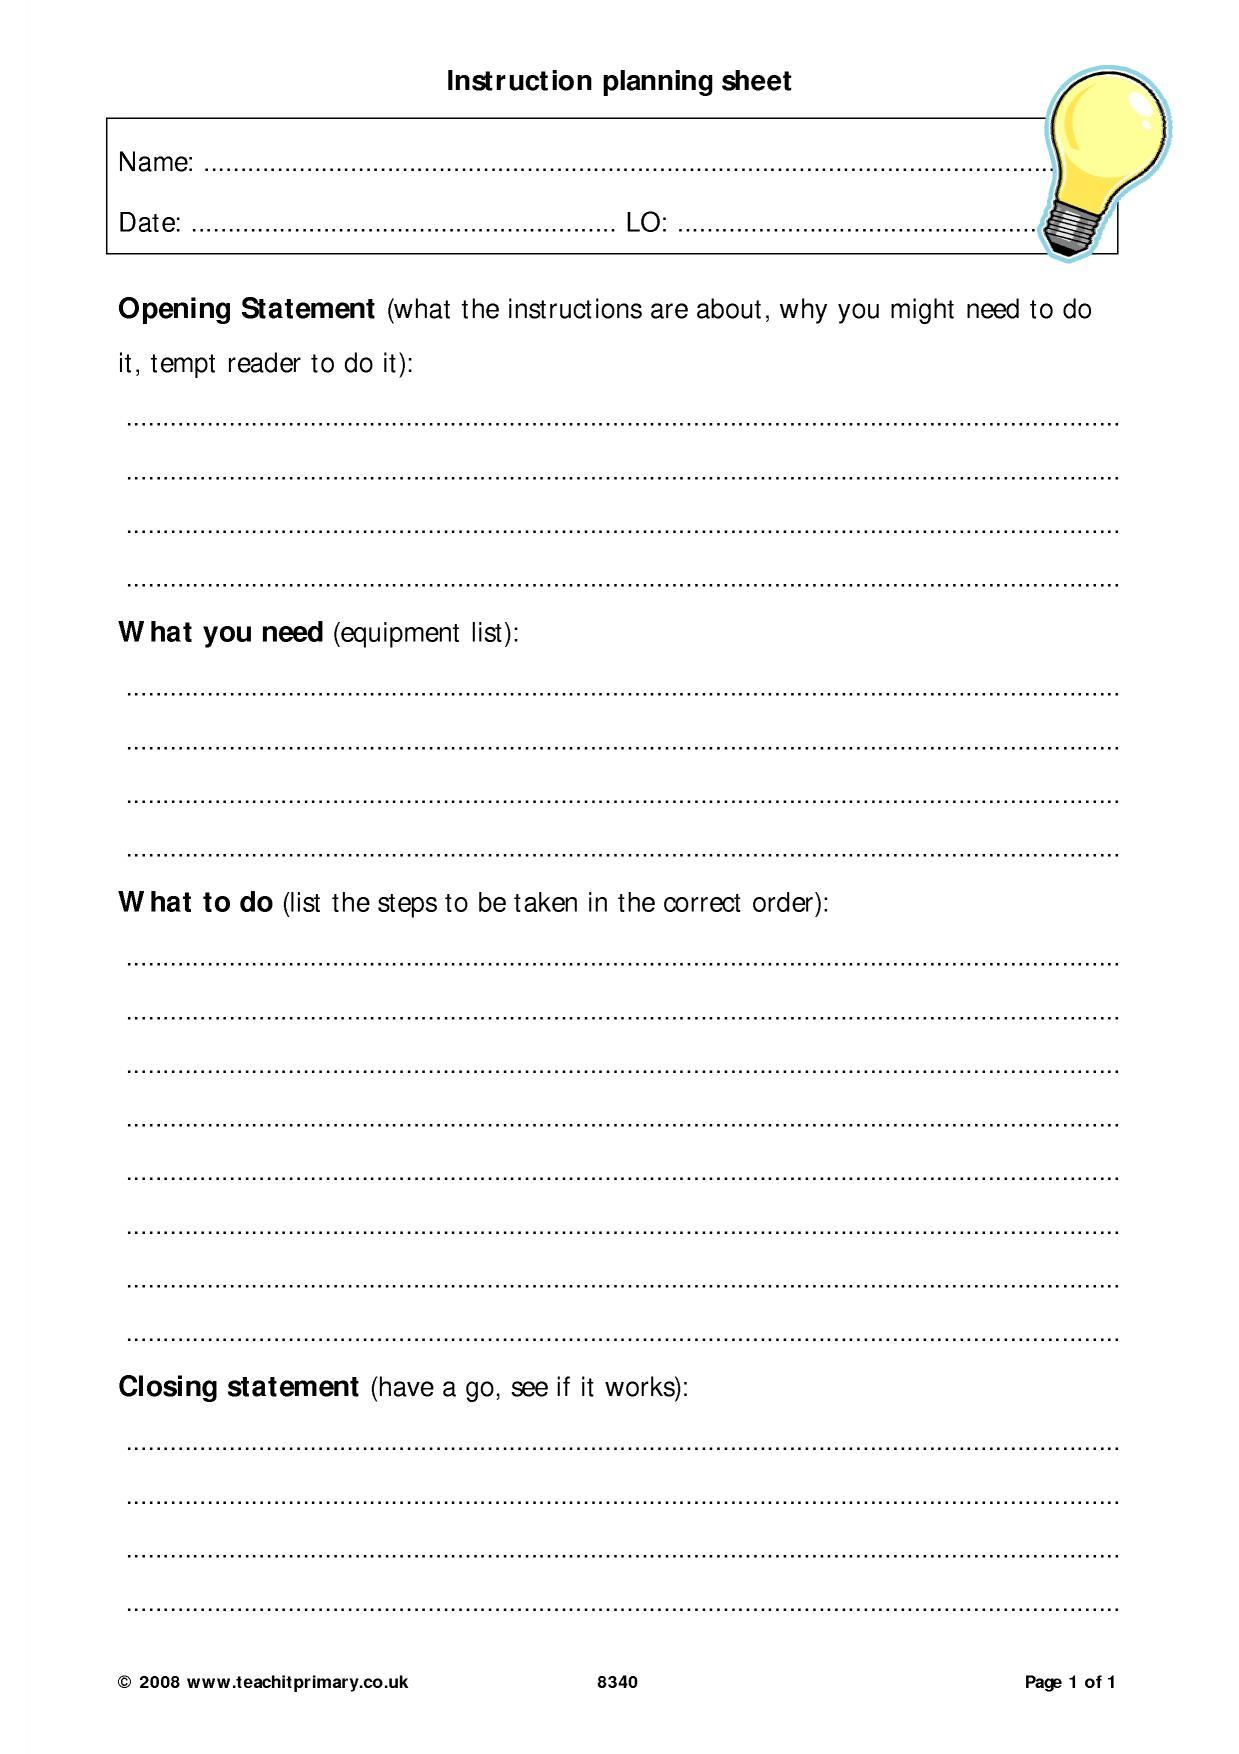 Instruction Planning Sheet